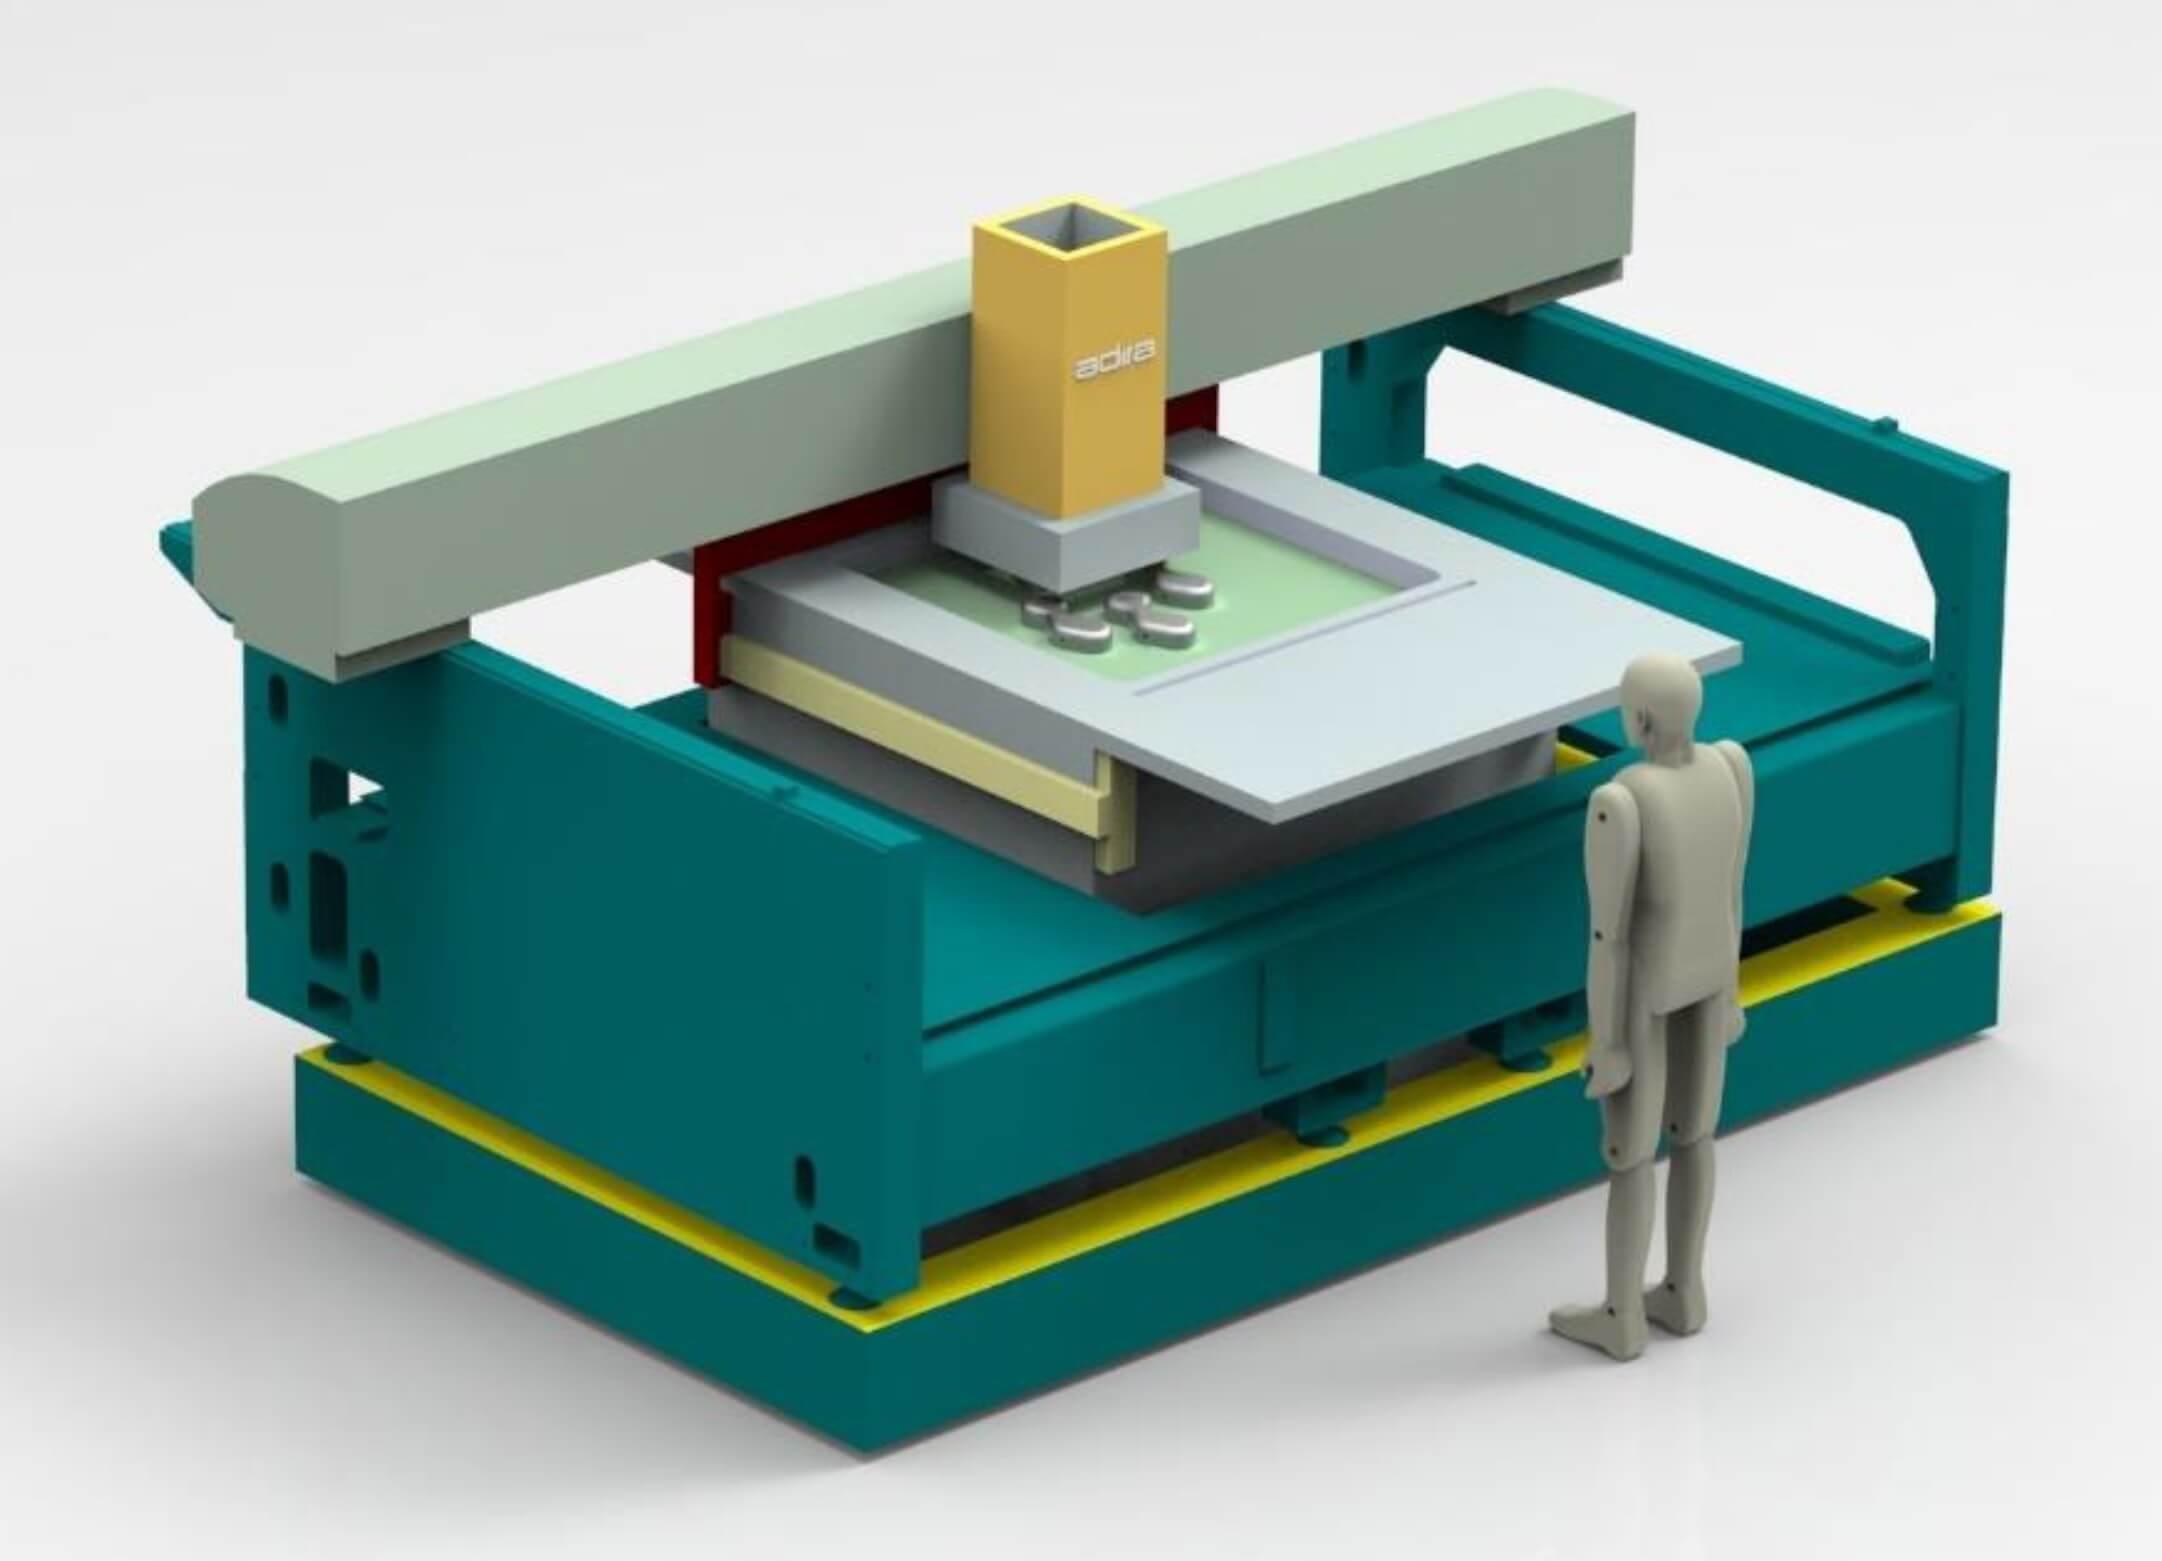 SLM-XL ADIRA - 3D printers